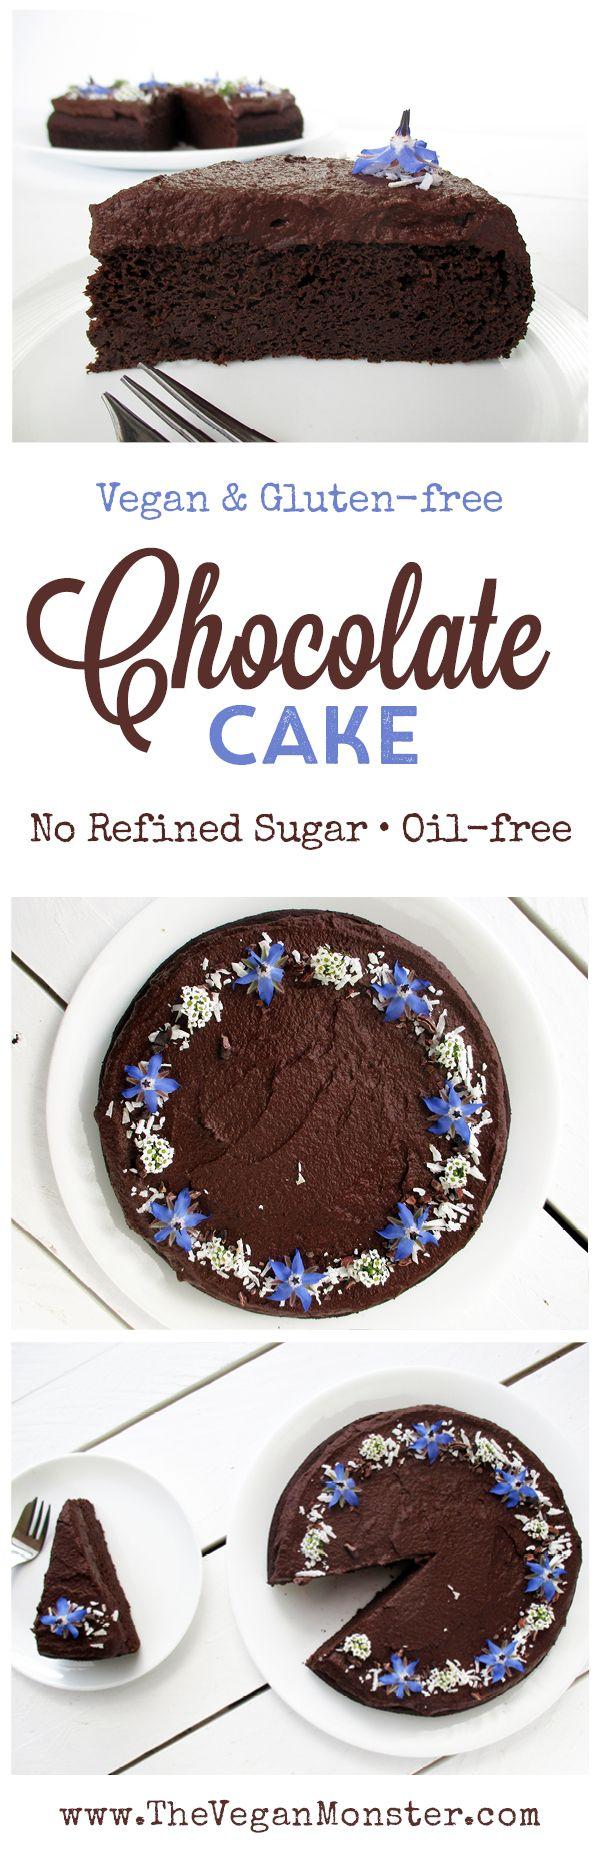 Chocolate cake. Vegan, gluten-free, oil-free. http://www.ground-based.com/blogs/recipes